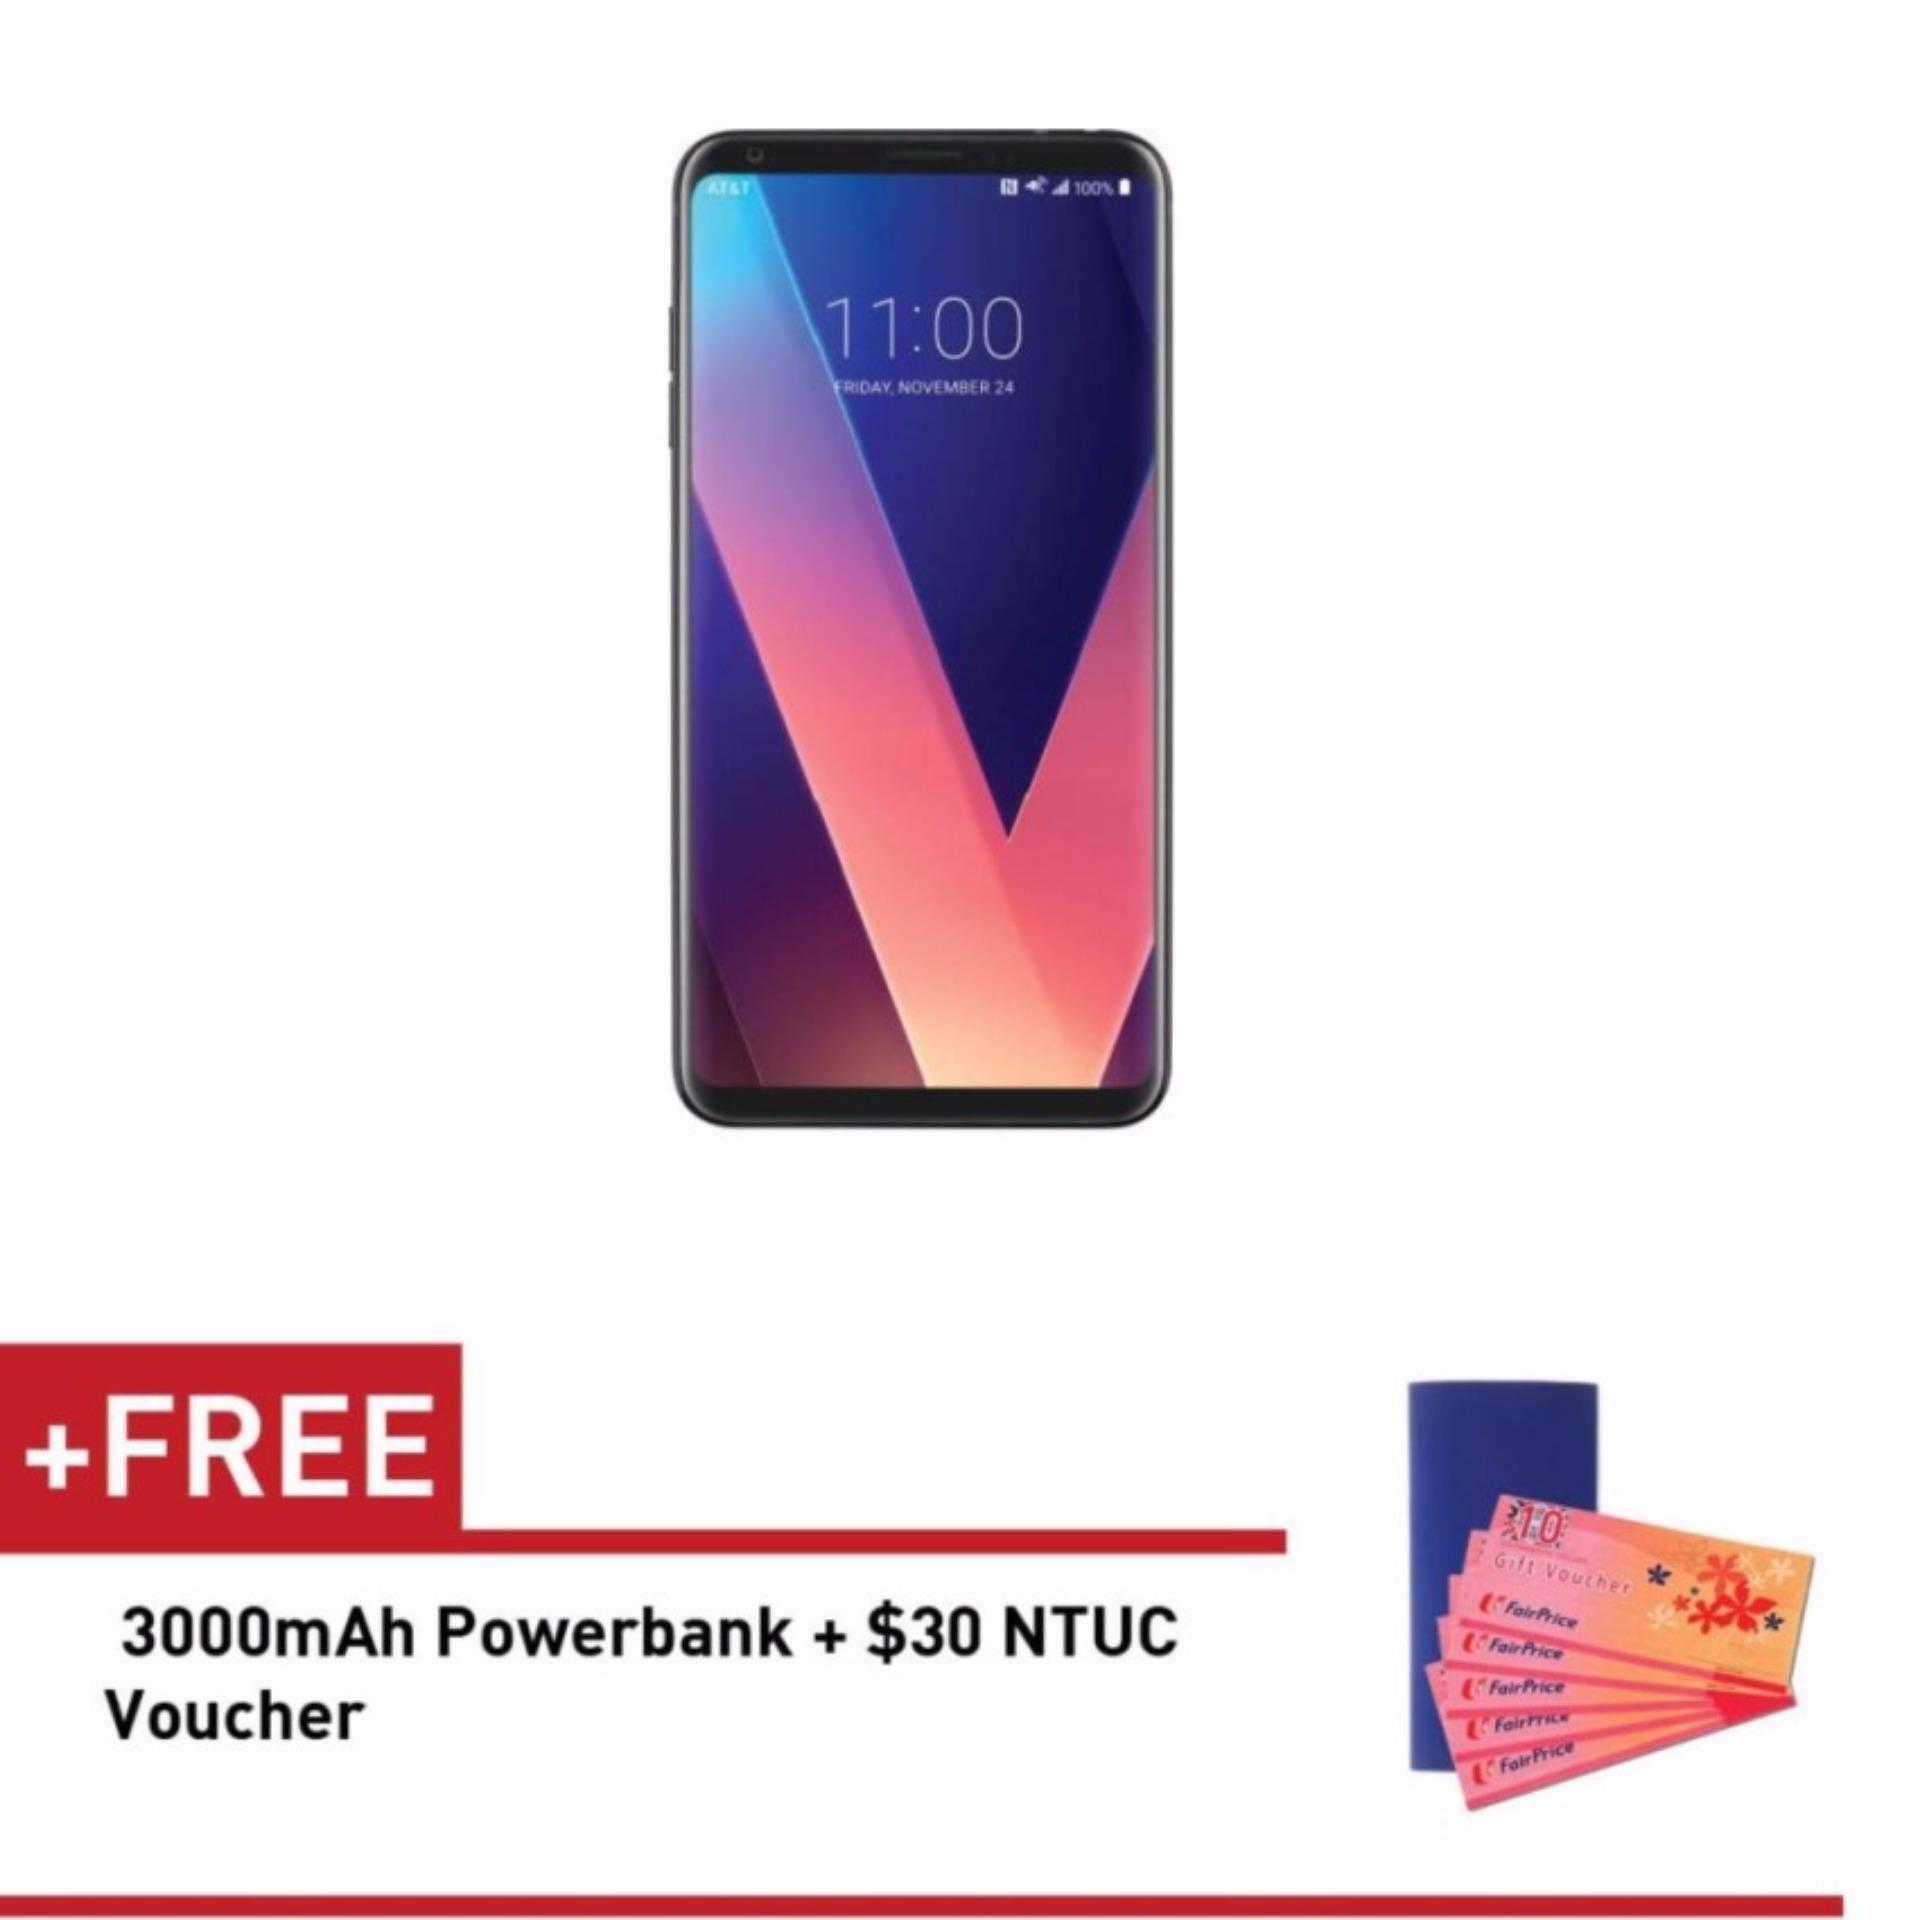 LG V30+ FREE iWalk 3000mAh Powerbank + $30 NTUC Voucher